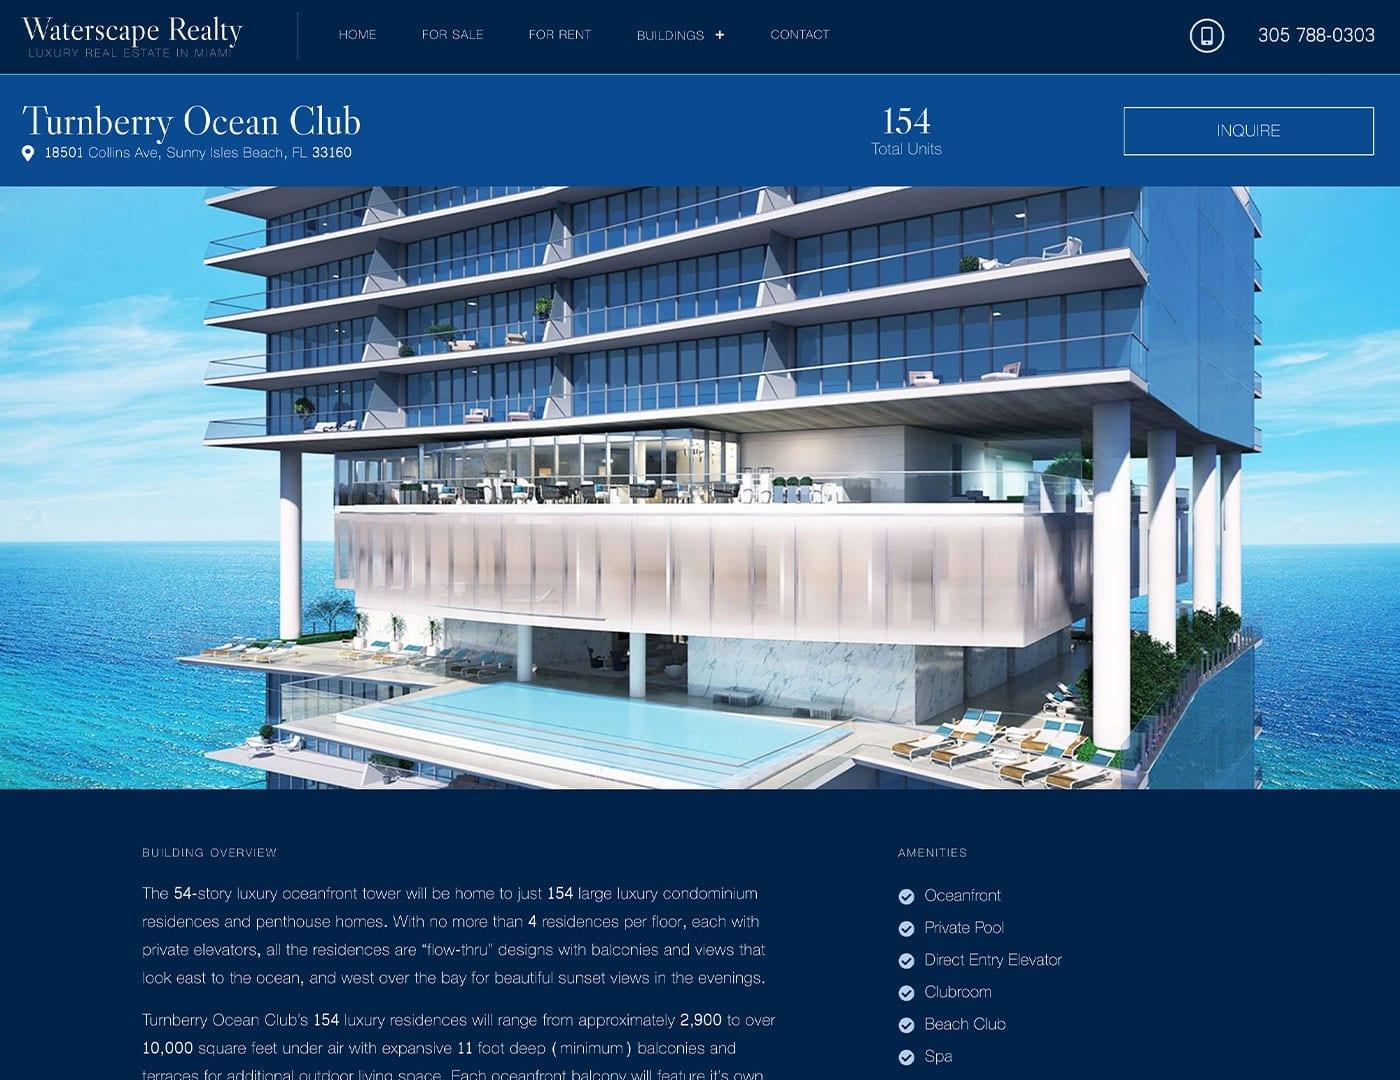 Waterscape Realty website design in Miami